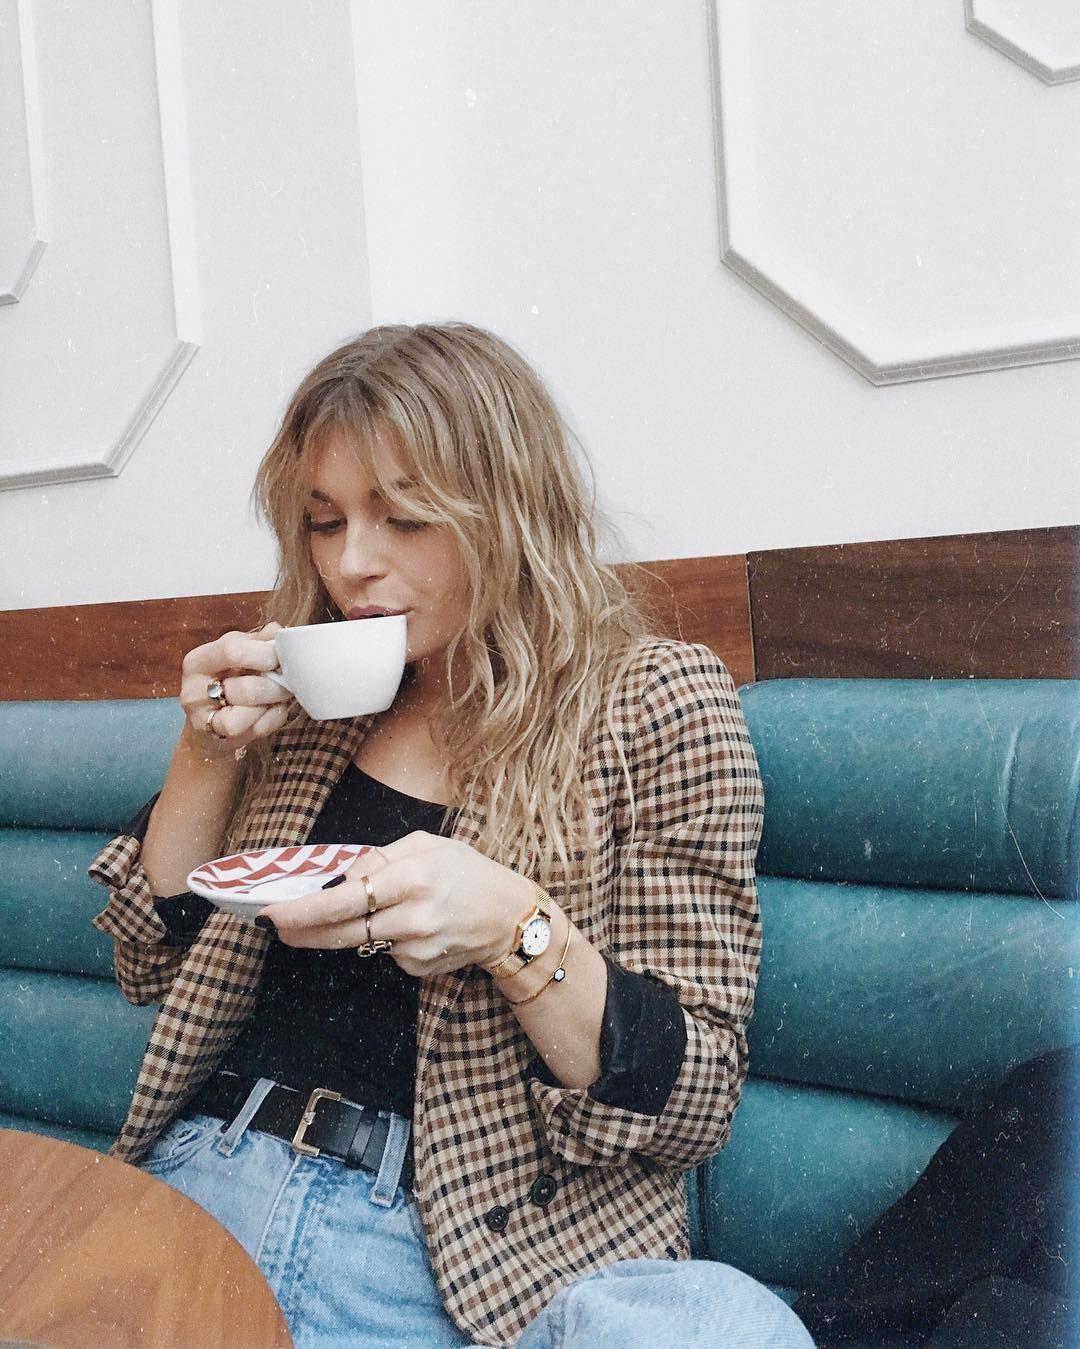 cacf22baad5 Allegra Shaw coffee shop denim plaid check hair coffee time cutoffs denim  jeans summer spring fashion style fashion jewelry